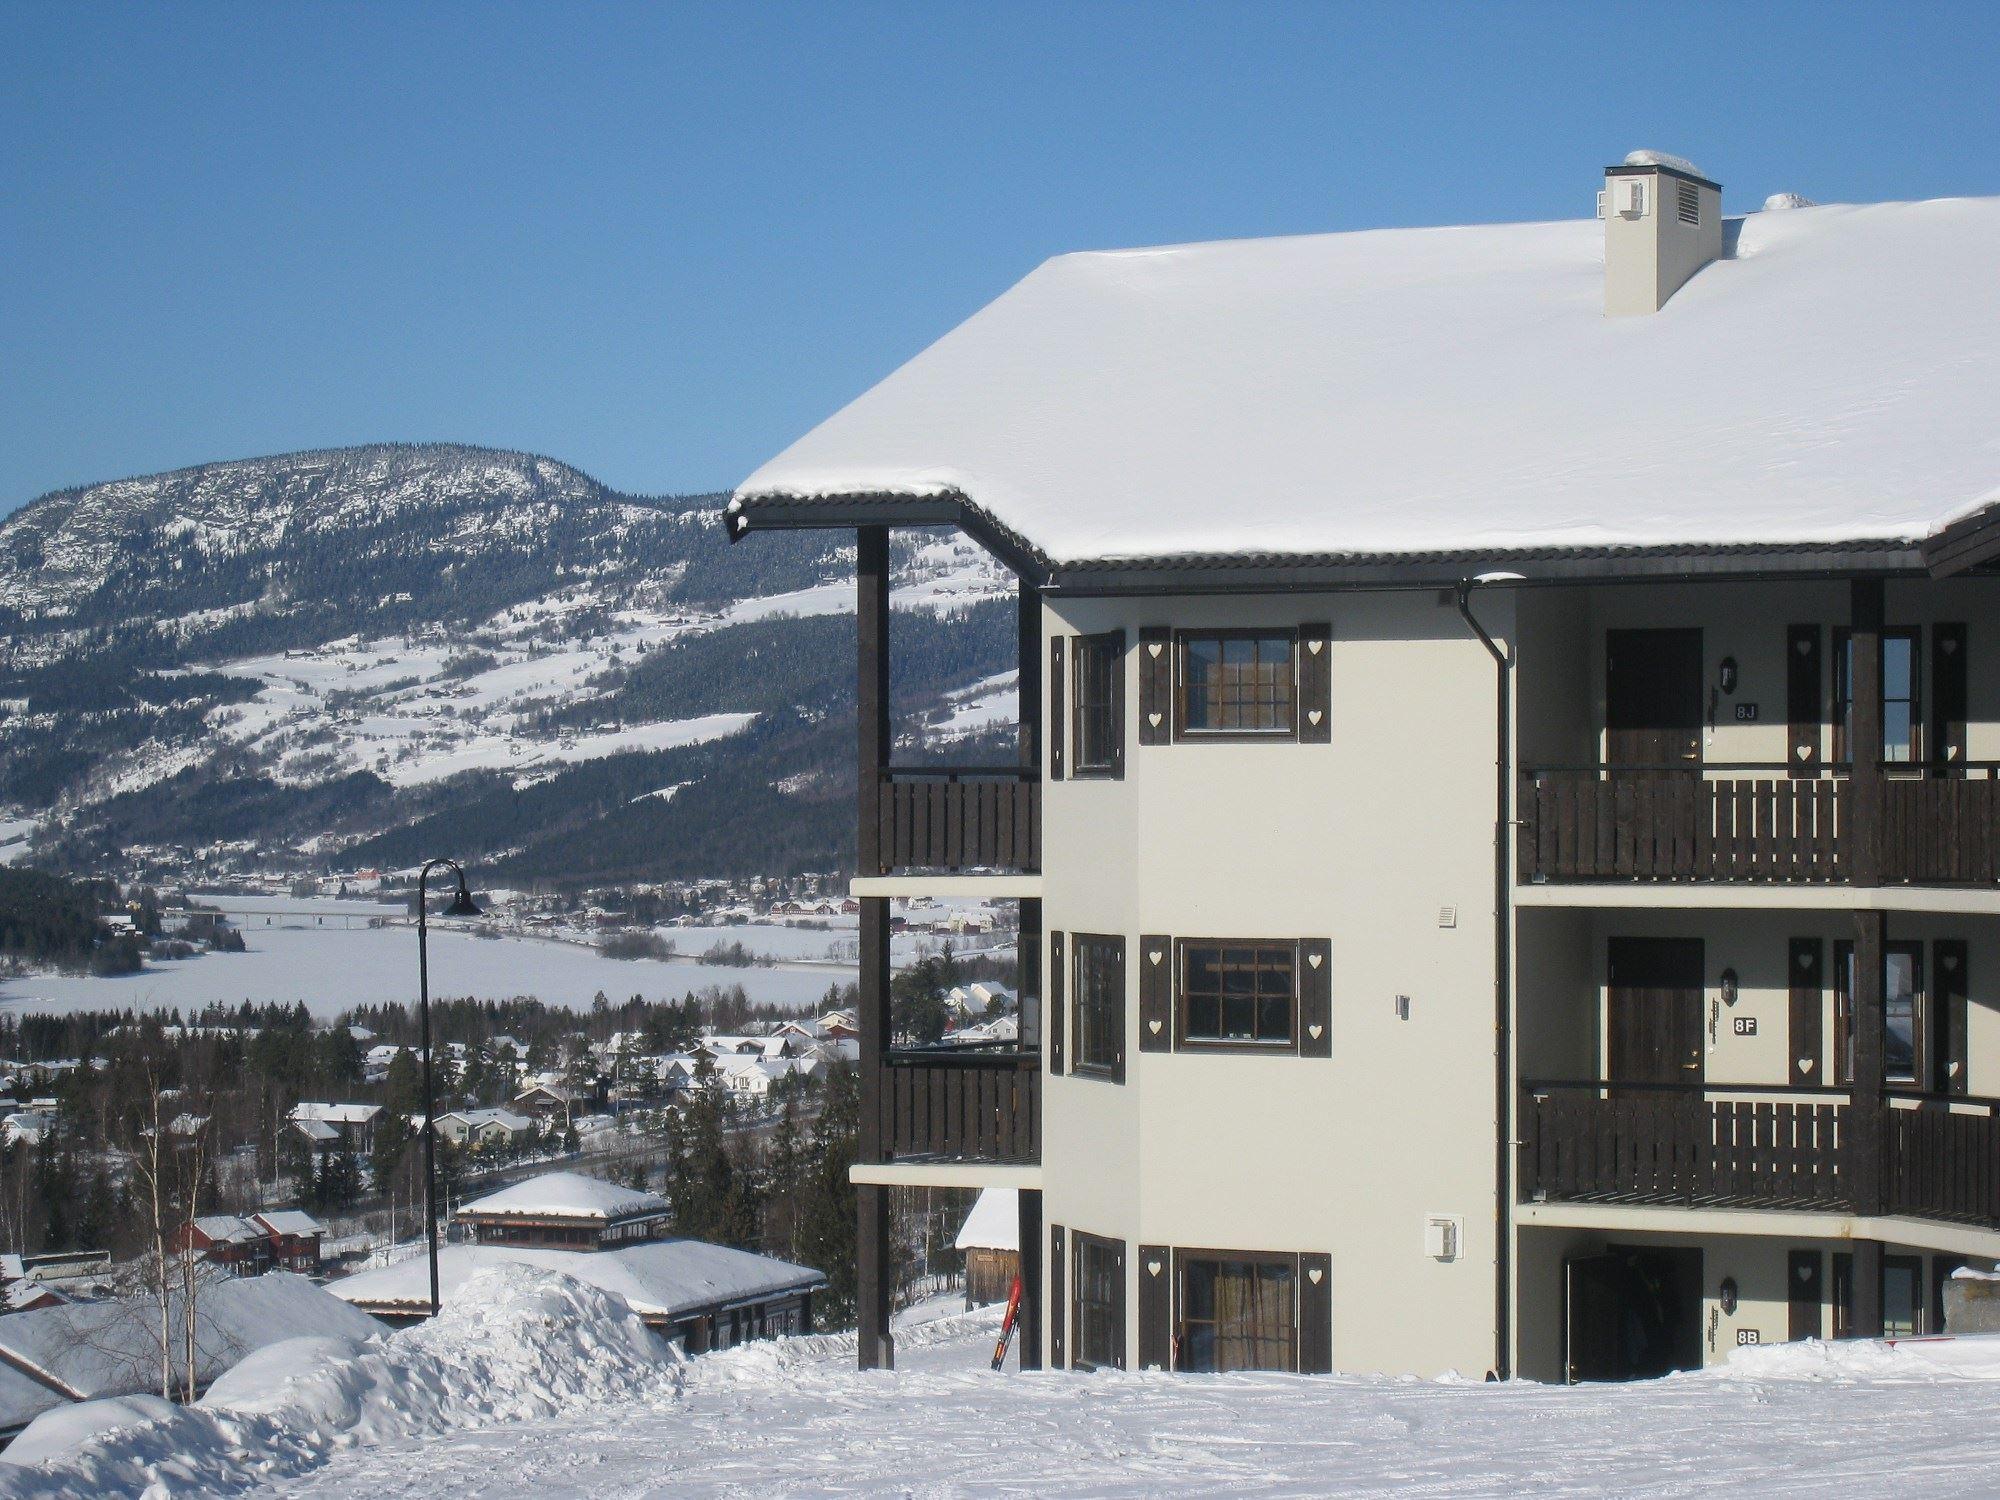 Alpin Apartments Sørlia in Hafjell